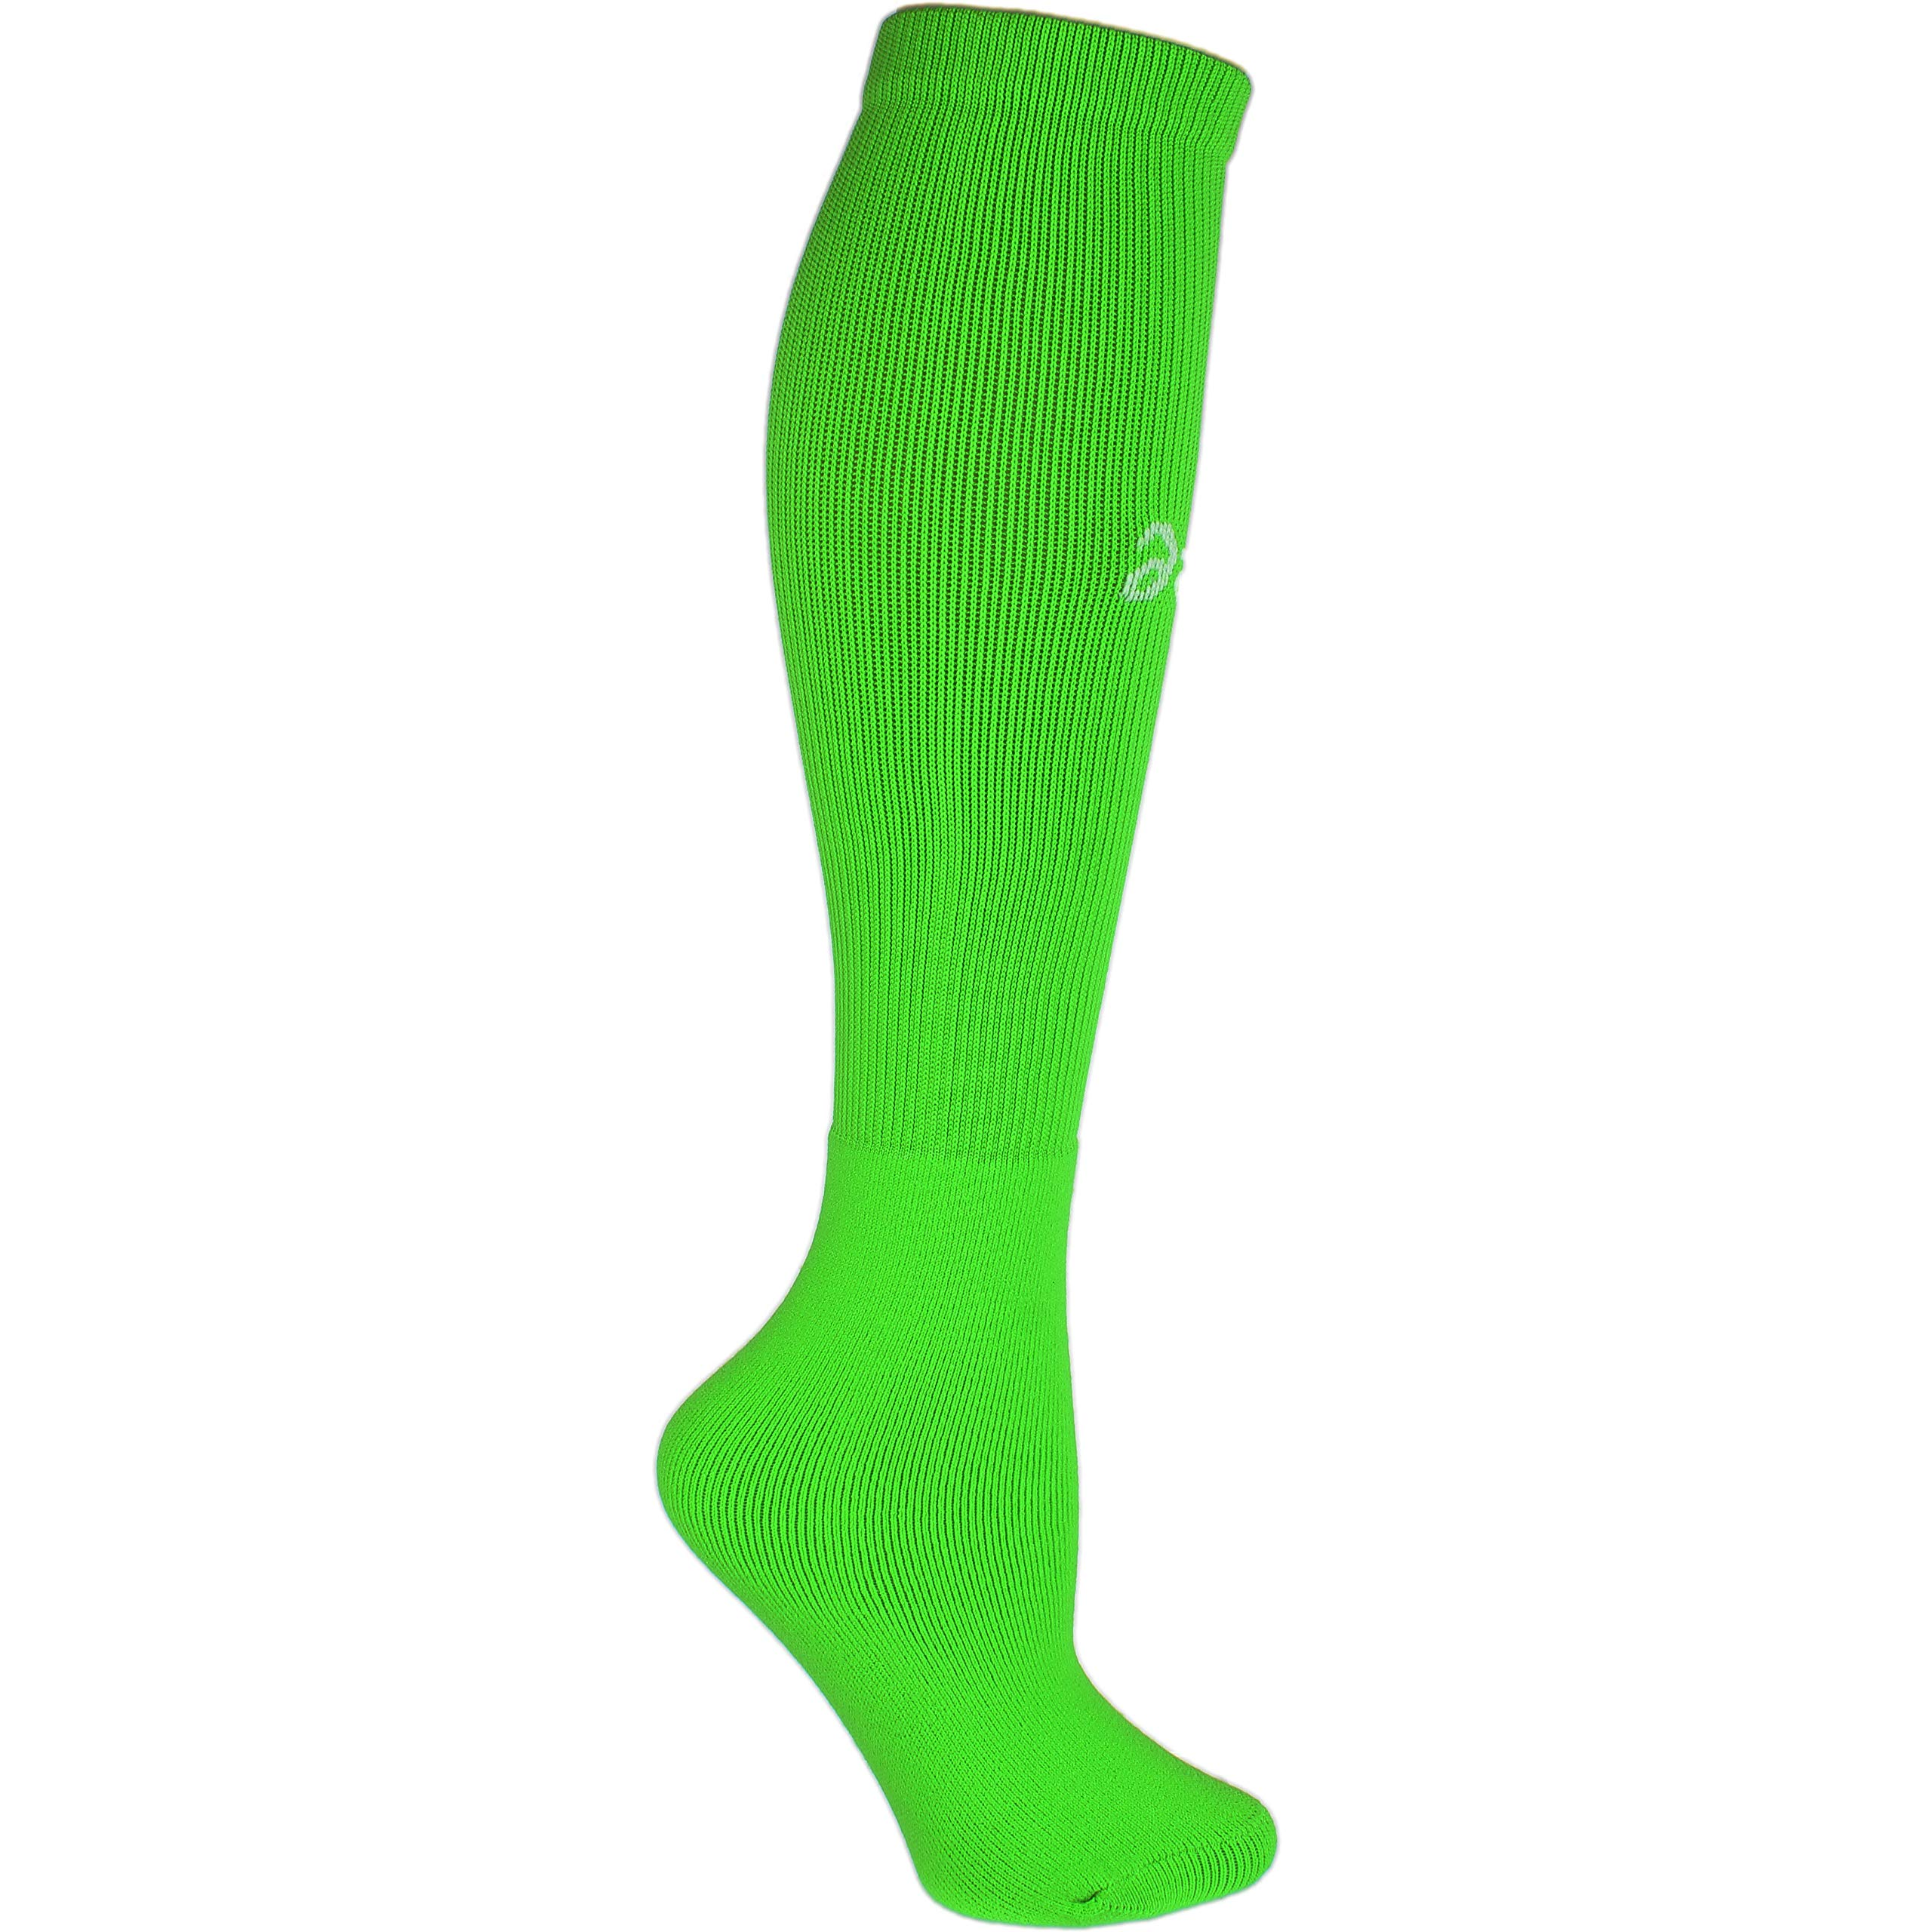 ASICS All Sport Court Sock, Neon Green, Large by ASICS